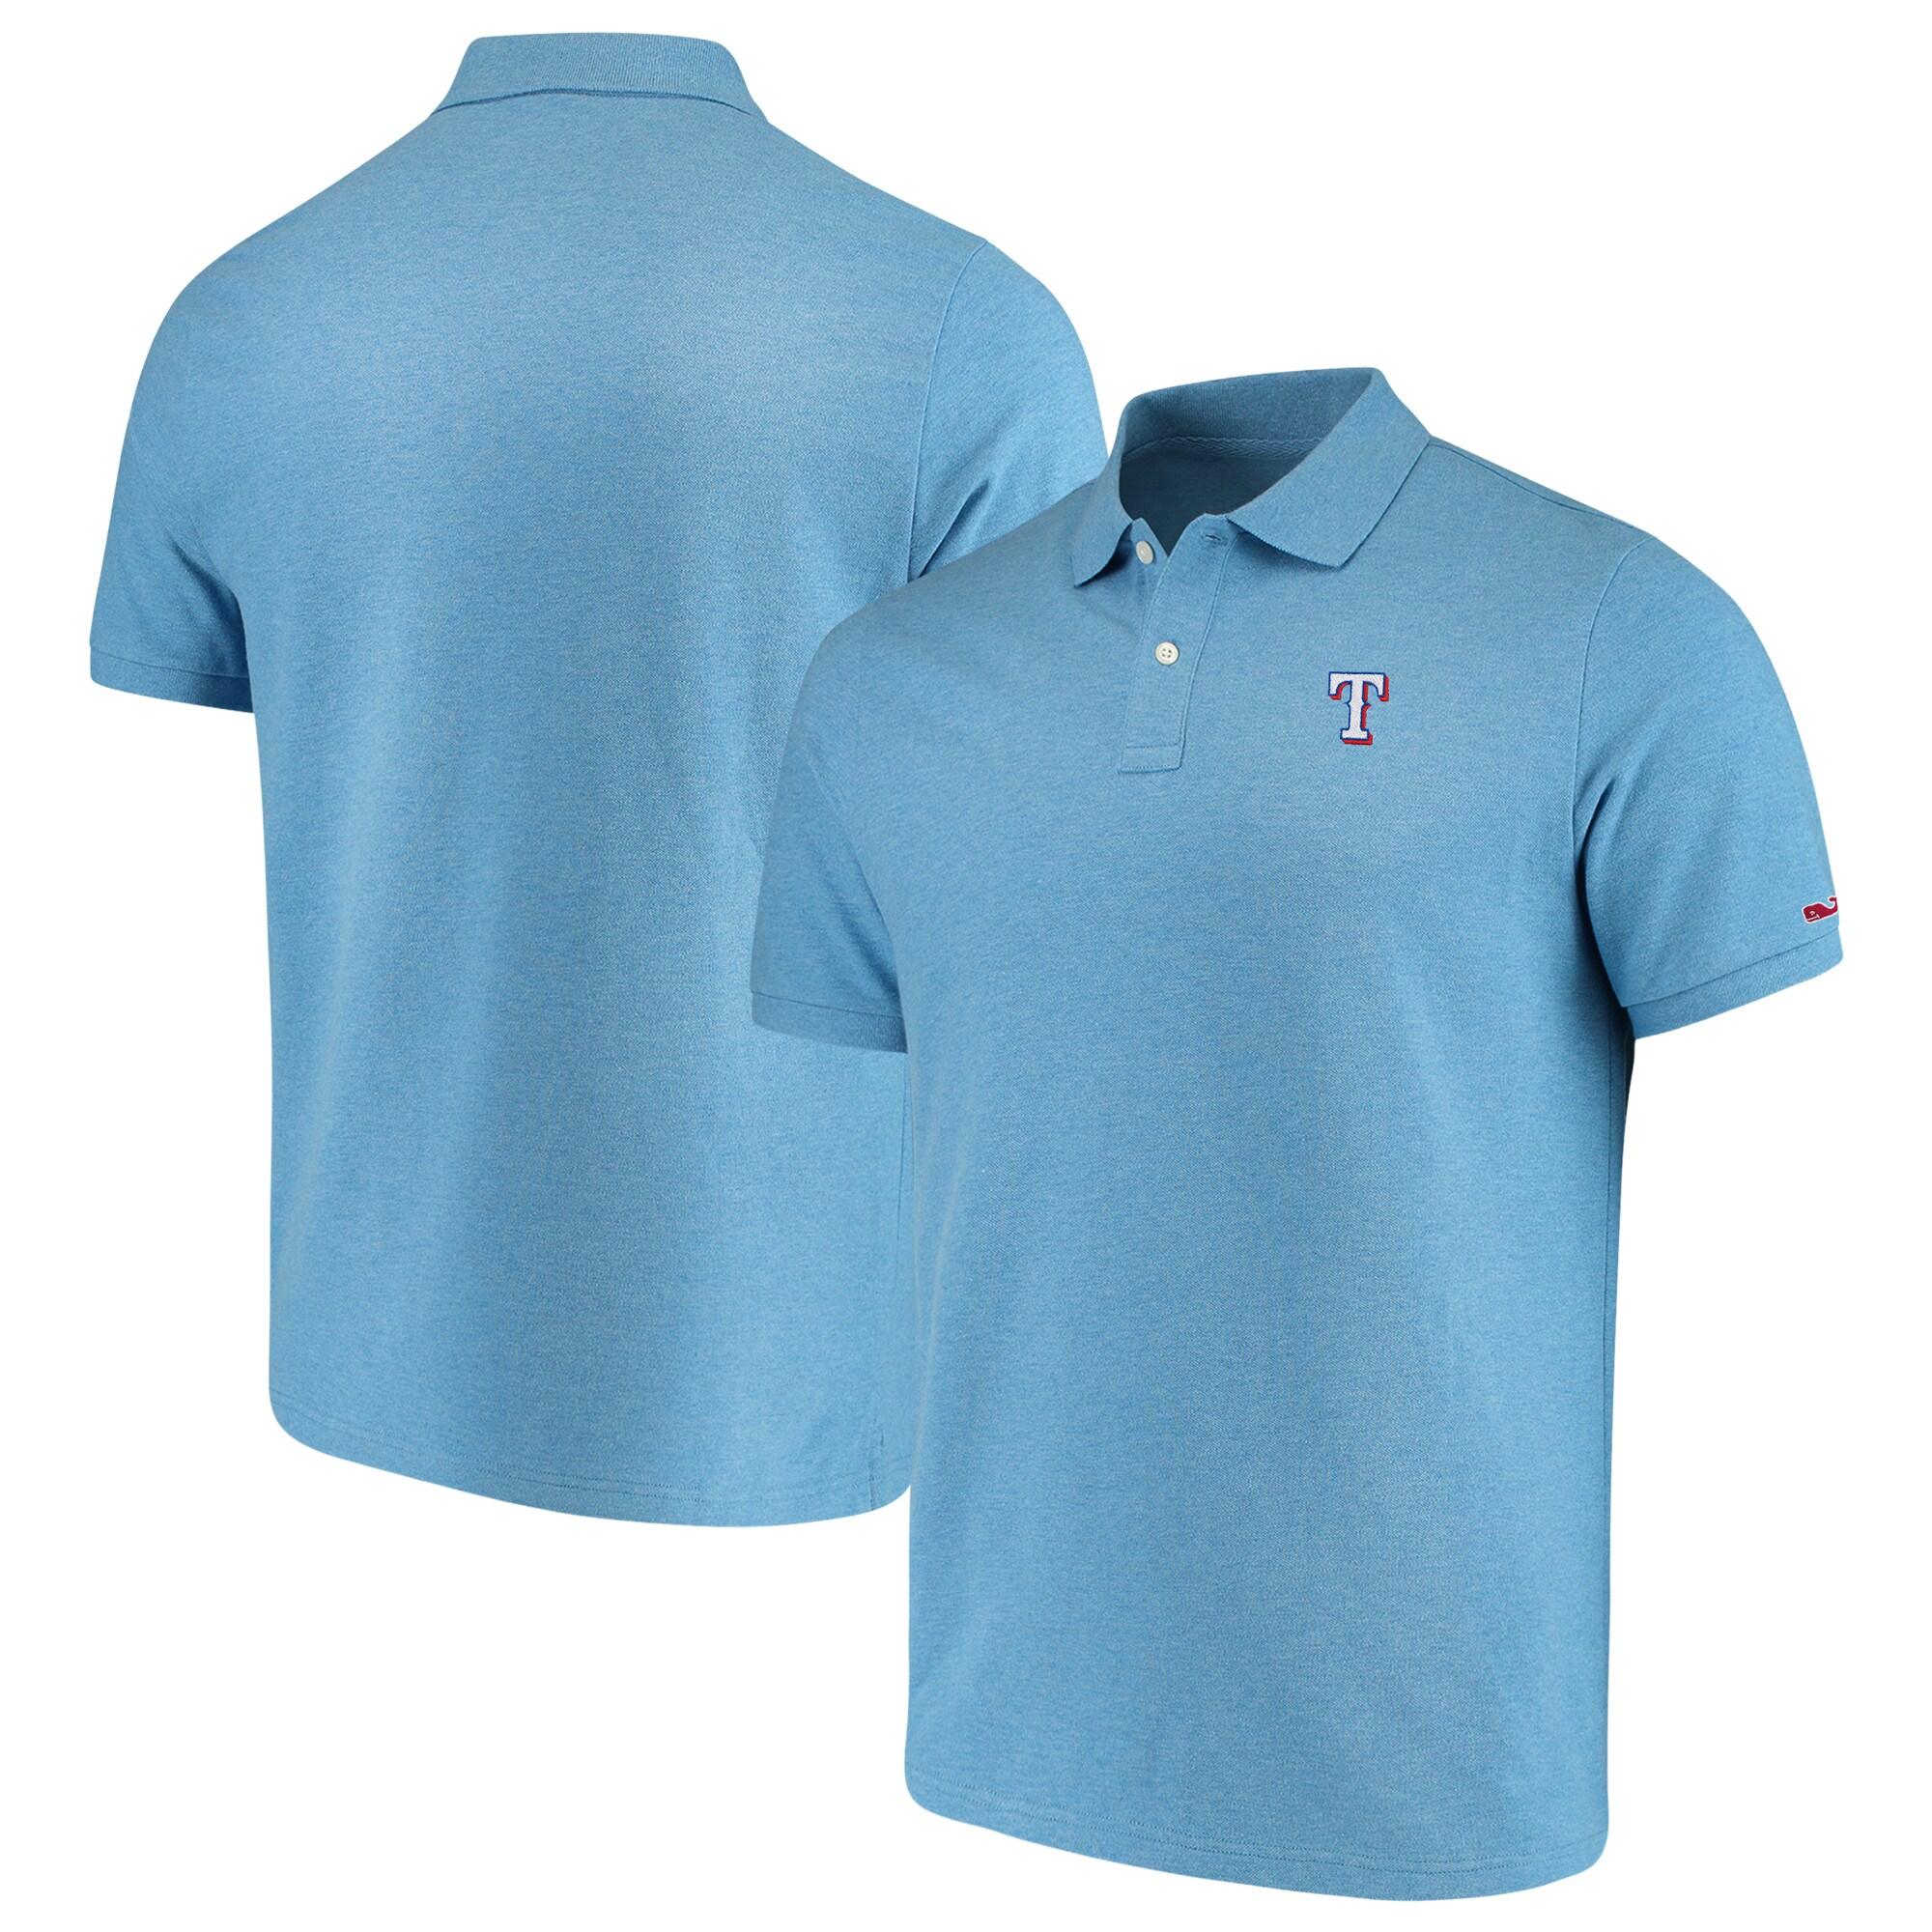 Texas Rangers Vineyard Vines Stretch Pique Polo - Light Blue